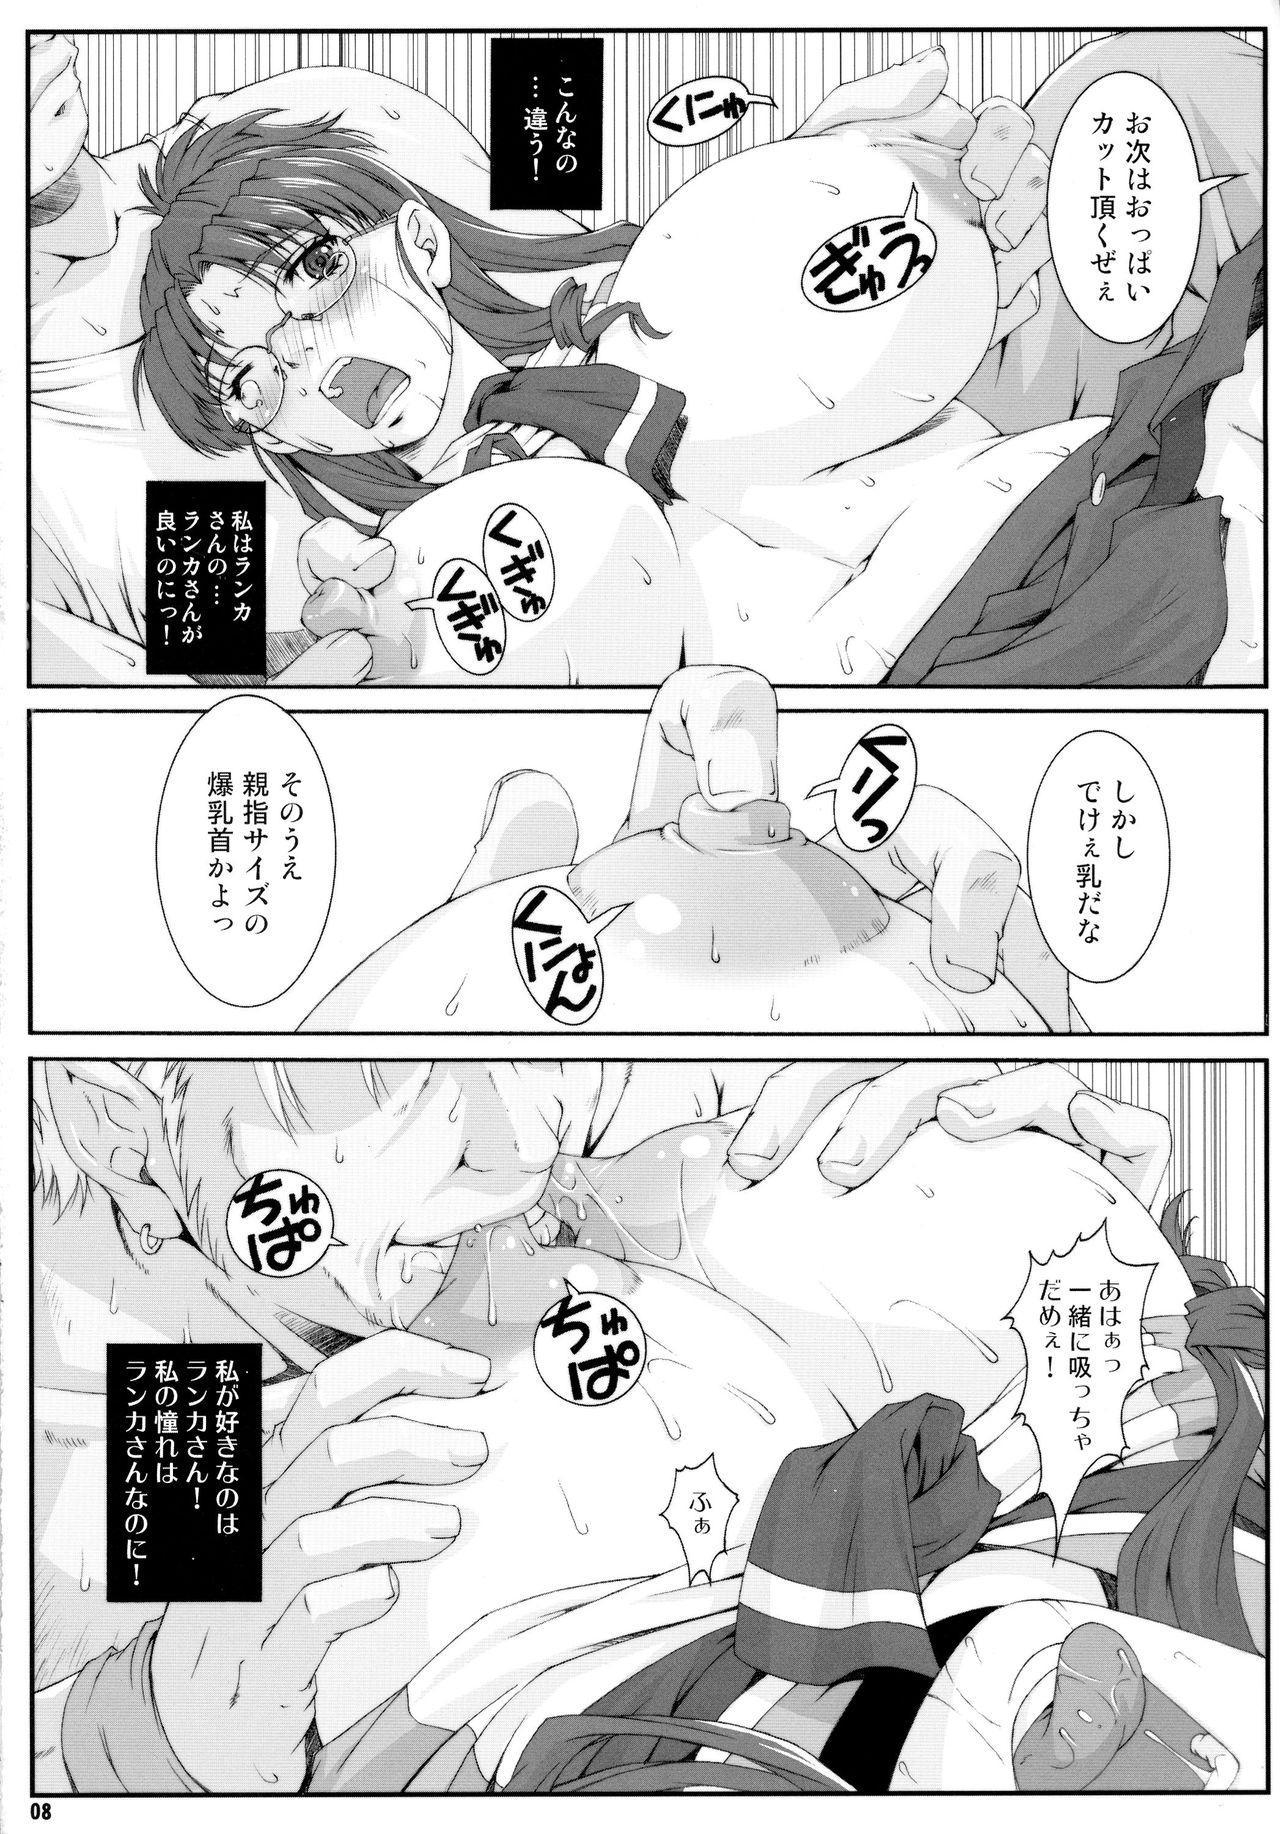 Misoka no 5 7